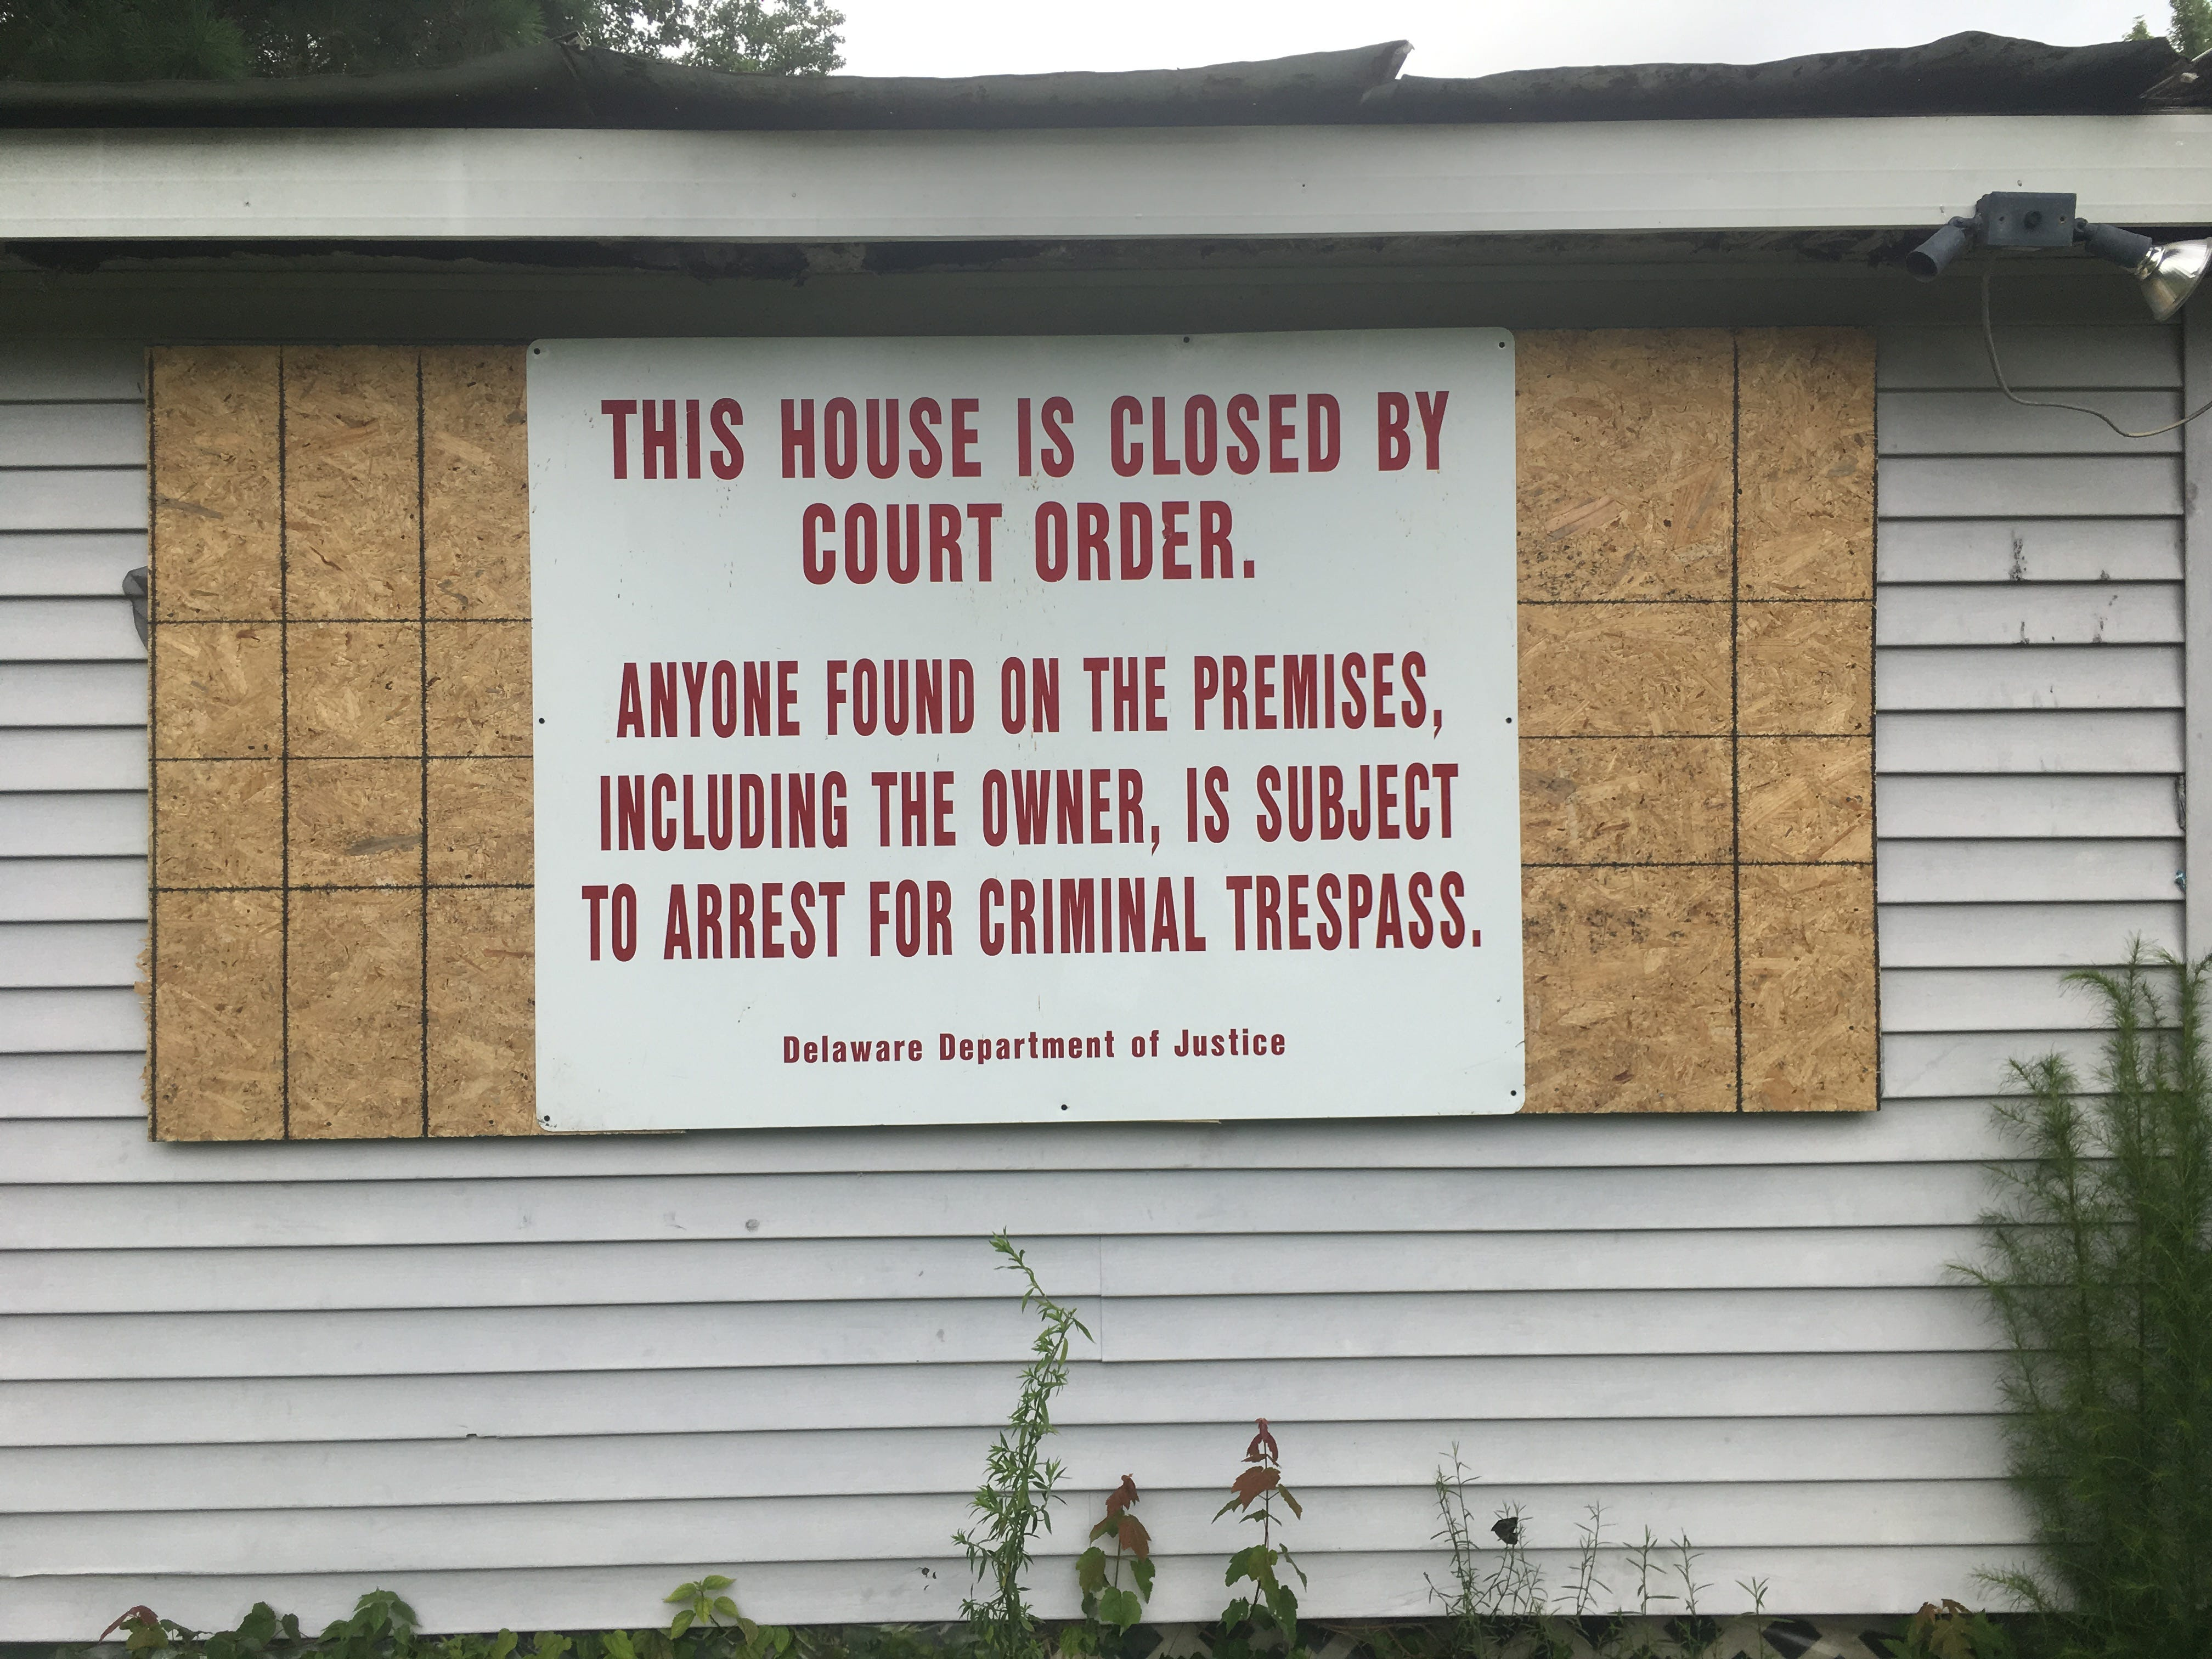 Judge orders home boarded up as criminal nuisance after reports of drug, gun crimes   Delaware Online